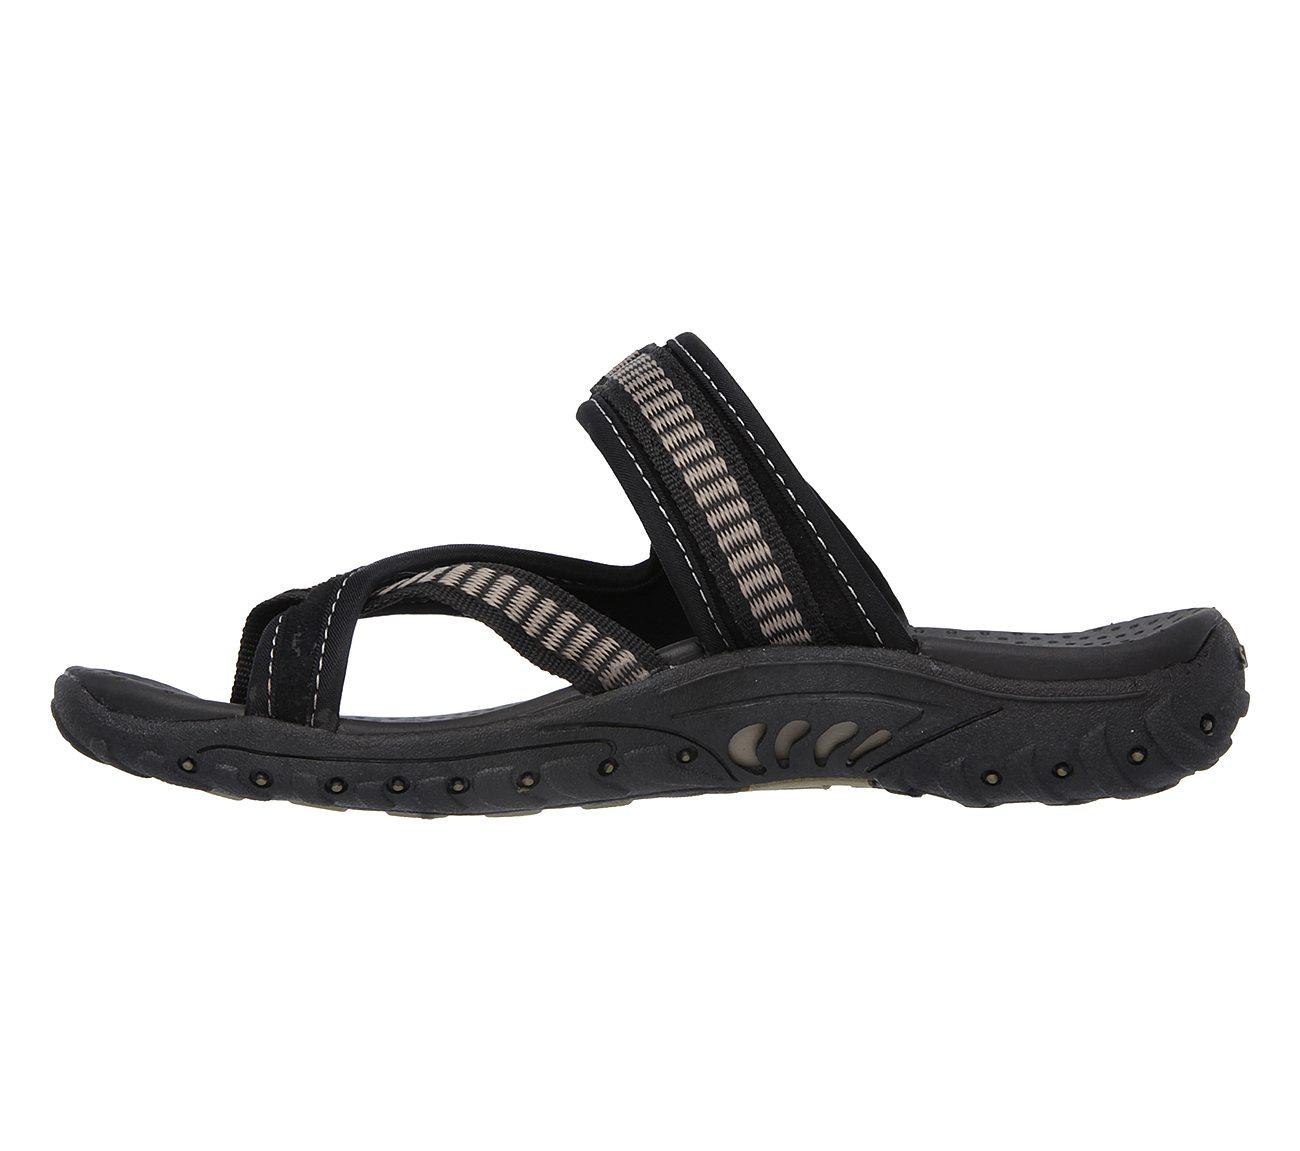 e09f42eb52cc Buy SKECHERS Reggae - Rasta Modern Comfort Shoes only  23.80